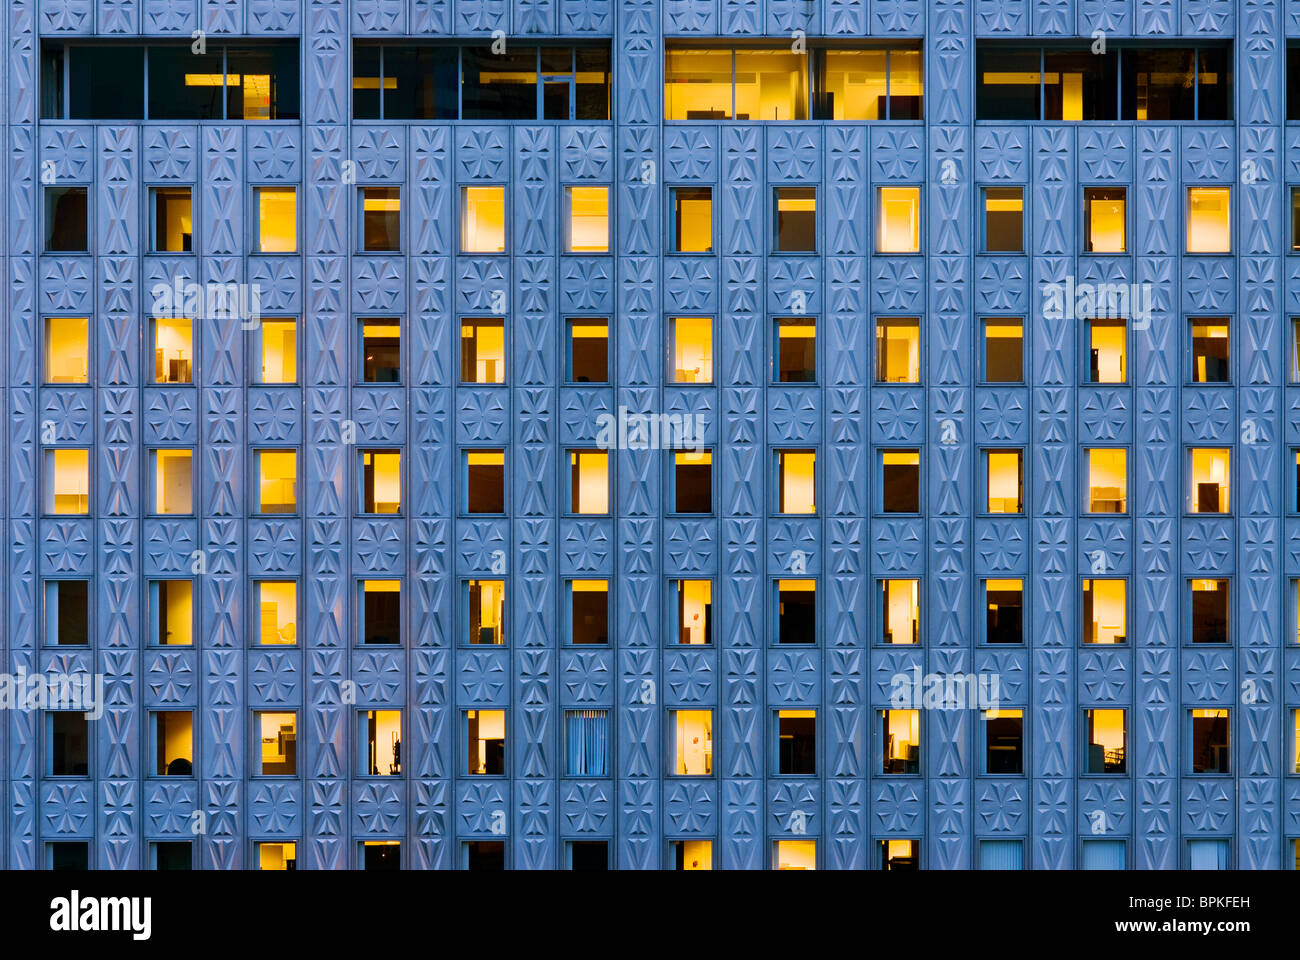 Das Mobil-Gebäude auf 42nd Street, New York City. Stockbild